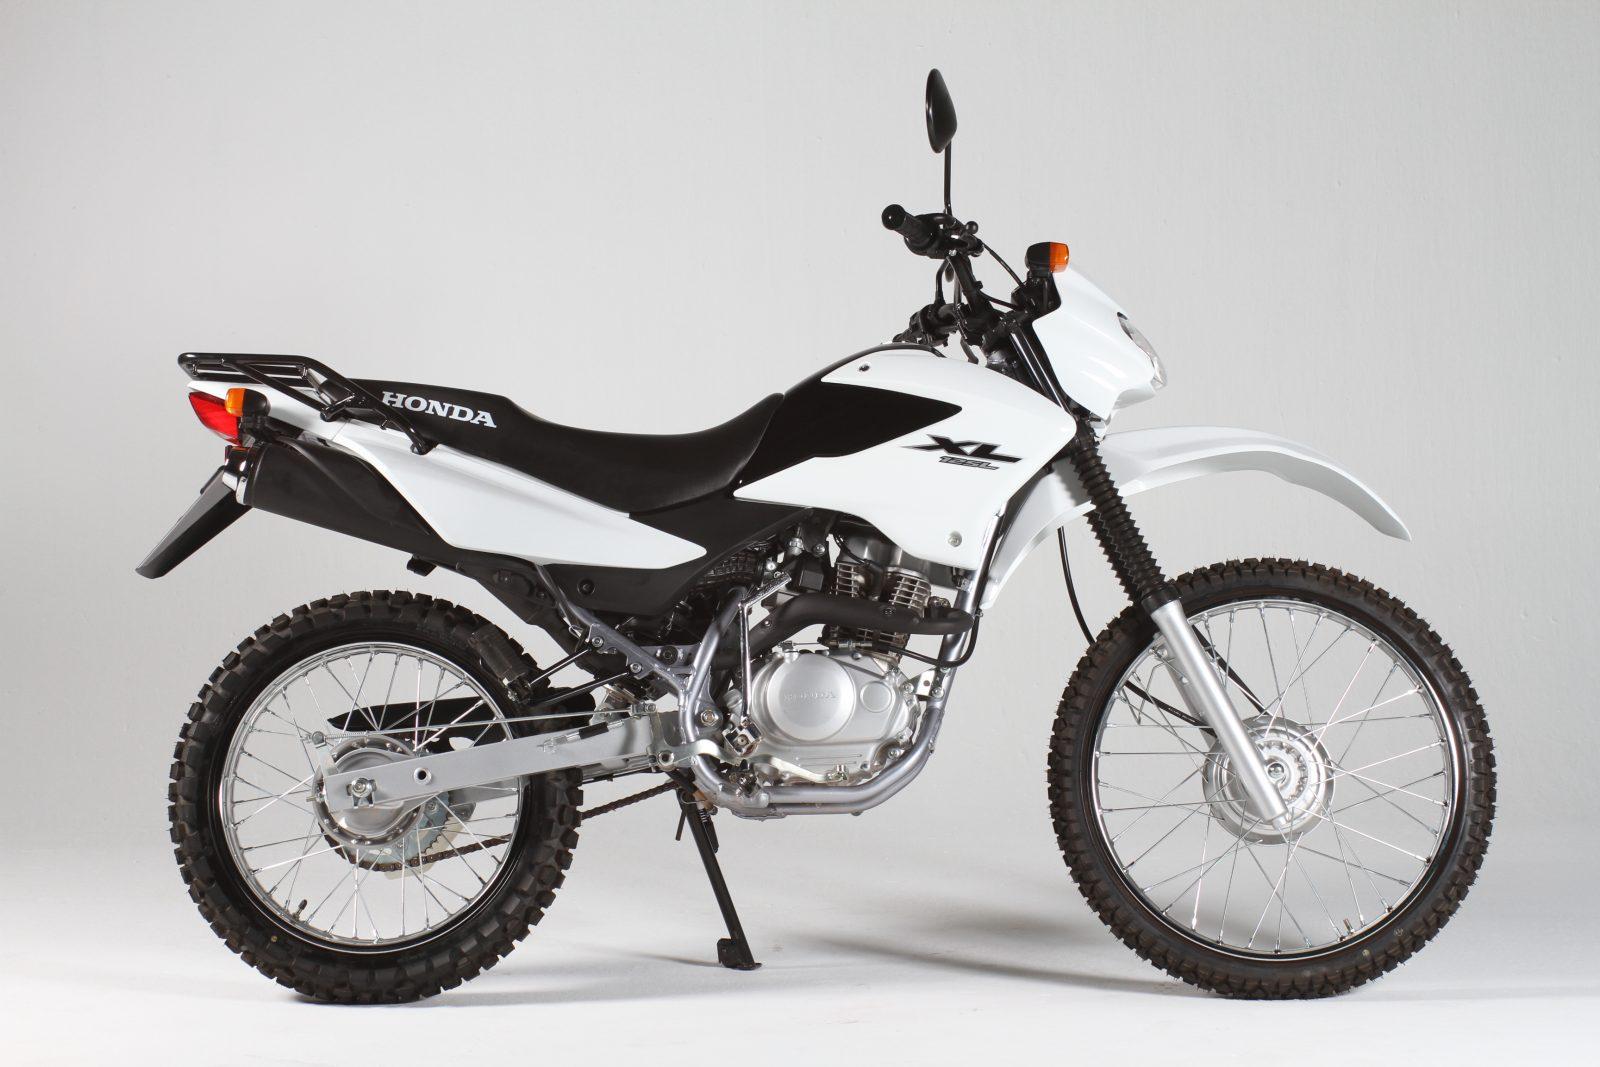 HONDA XL125LEK Motorcycle – 4 Stroke